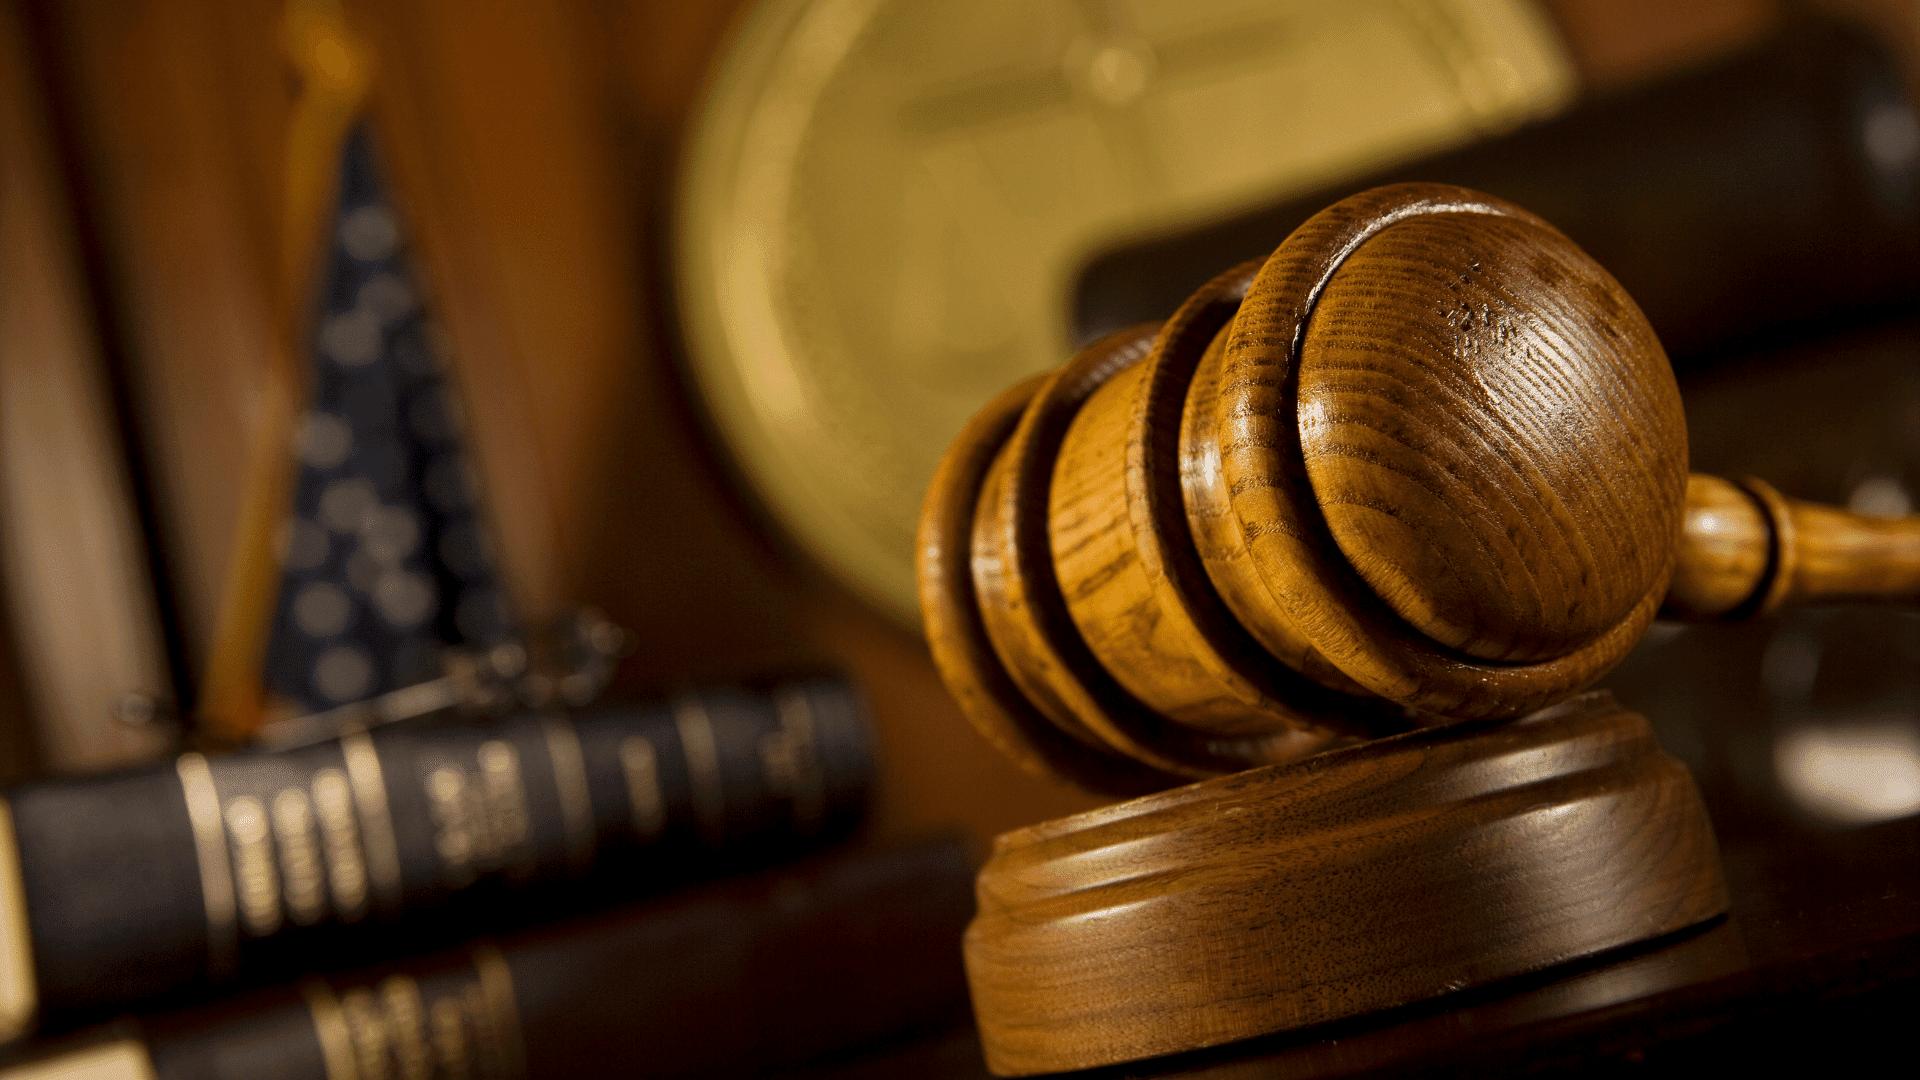 Civil Injury Cases vs. Criminal Cases: What Happens After an Assault?